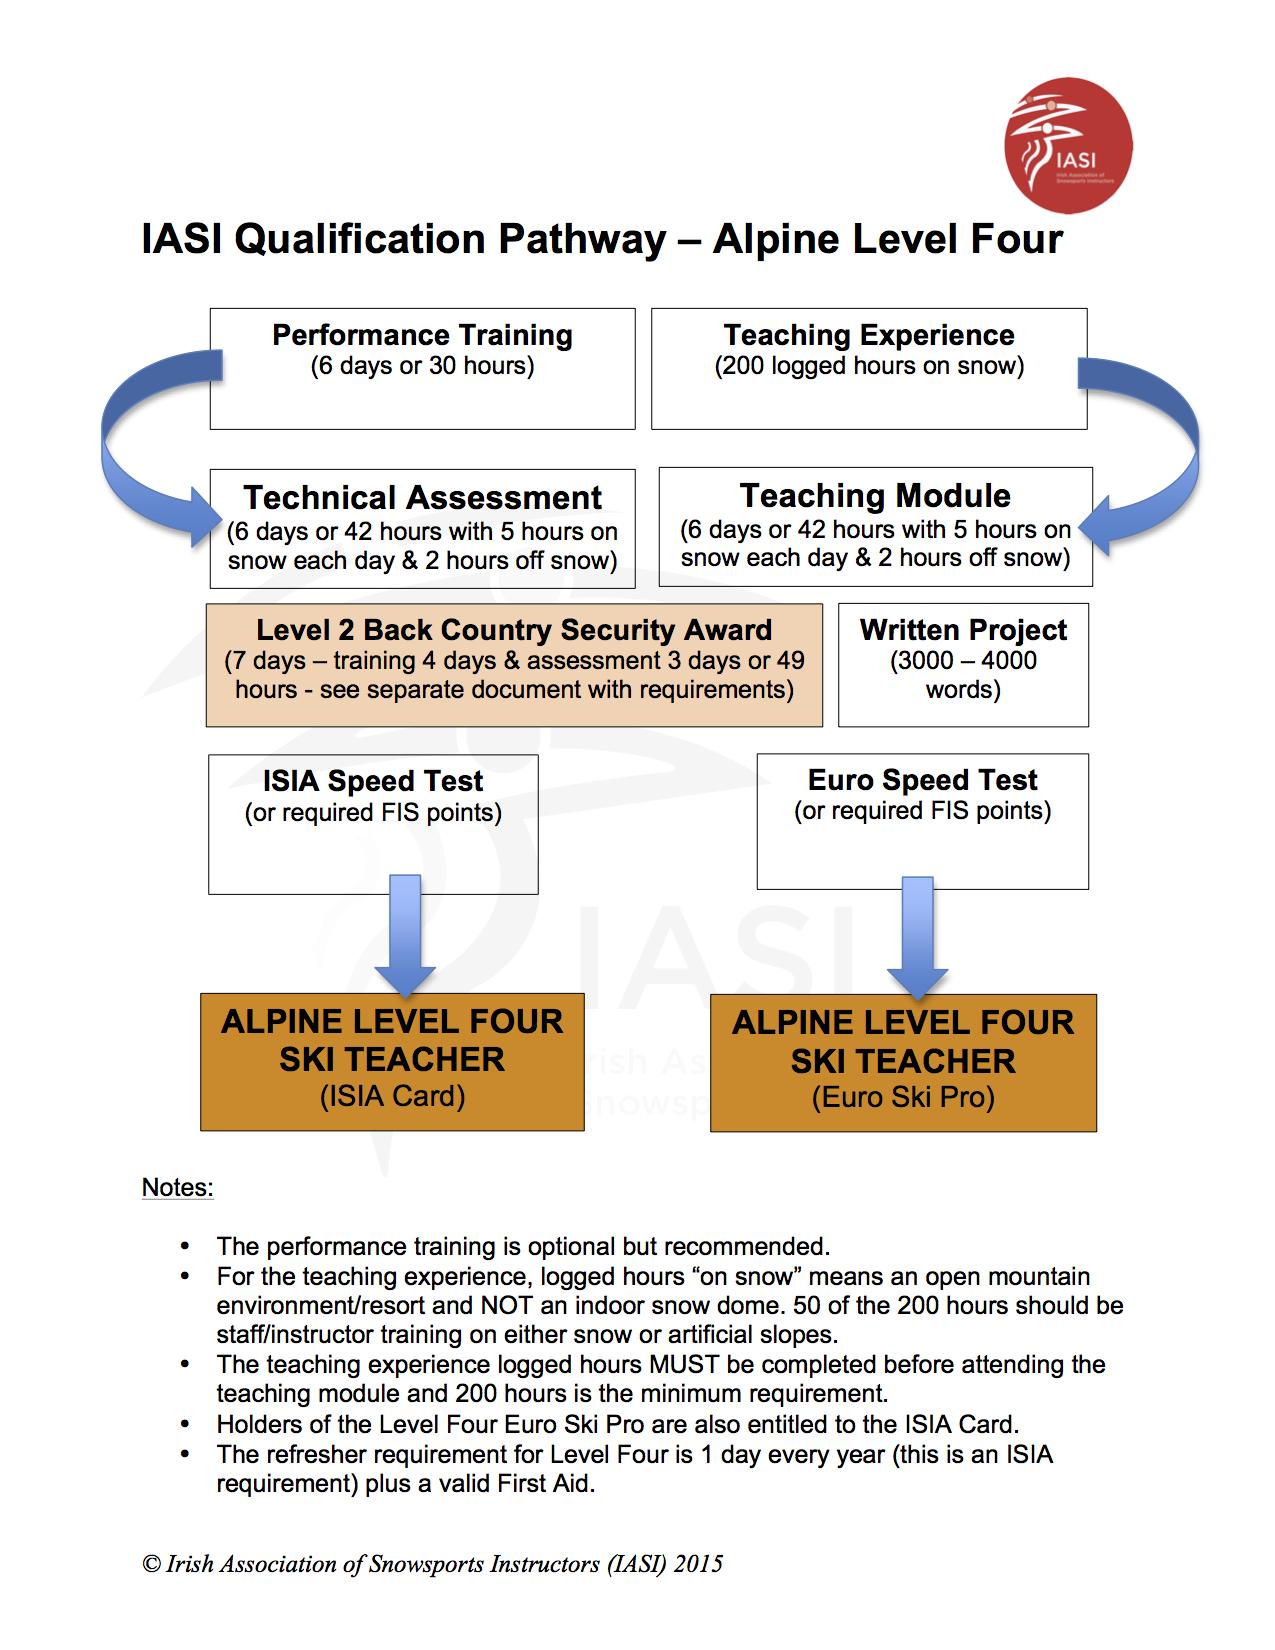 IASI Qualification Pathway Alpine Level 4